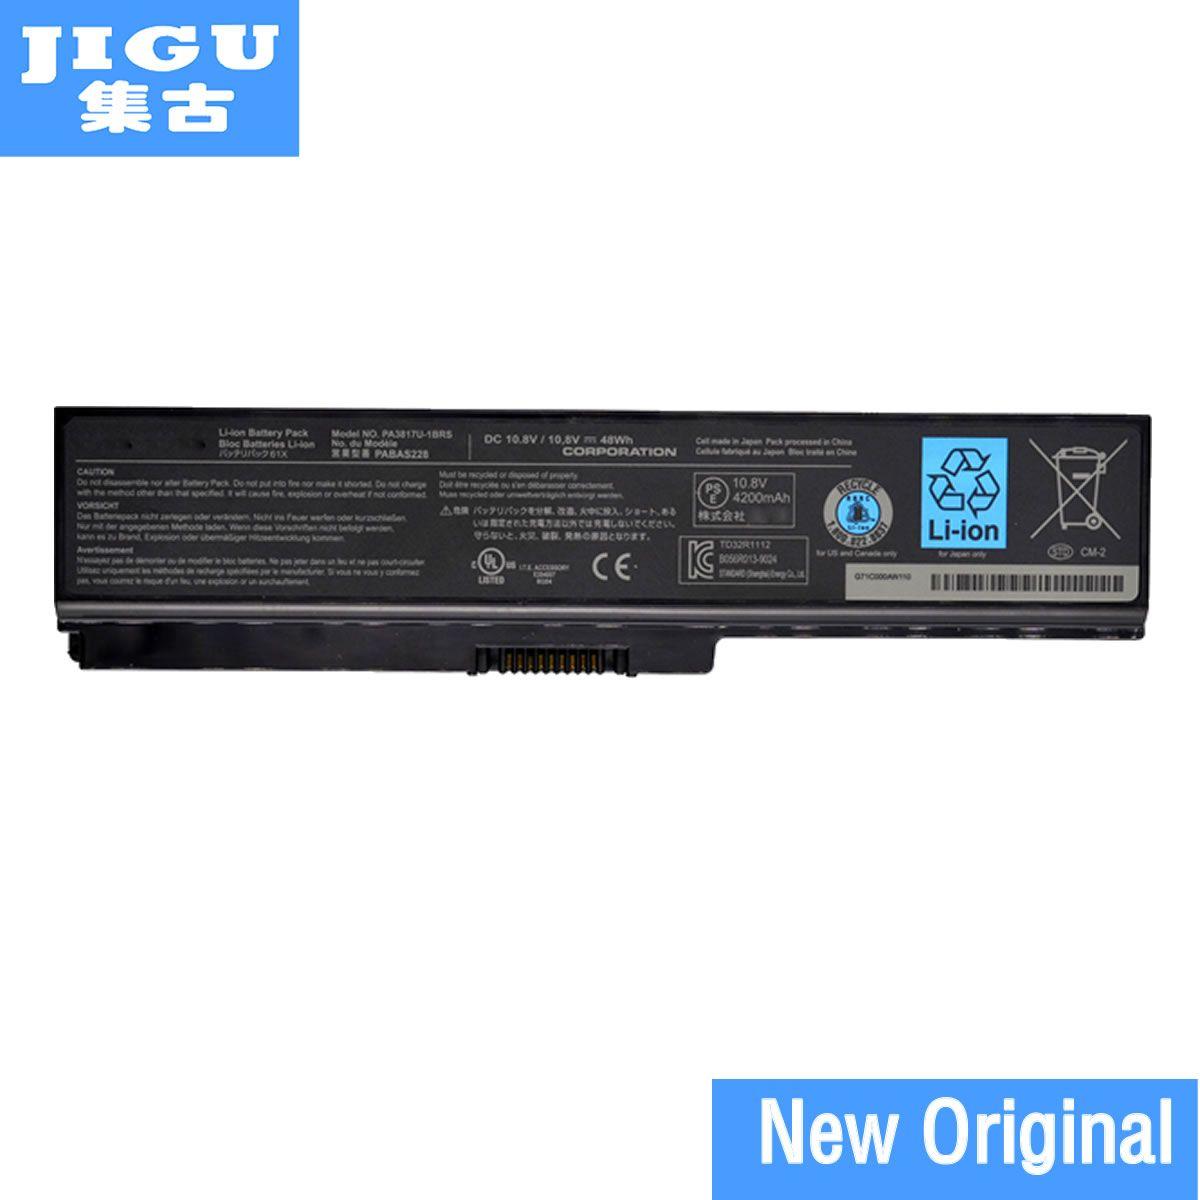 JIGU Original-akku Für Toshiba PA3817U-1BRS PA3817 PA3818U-1BRS PA3817U Für Satellite L745 L740 L655 L750 L750D L755 L630